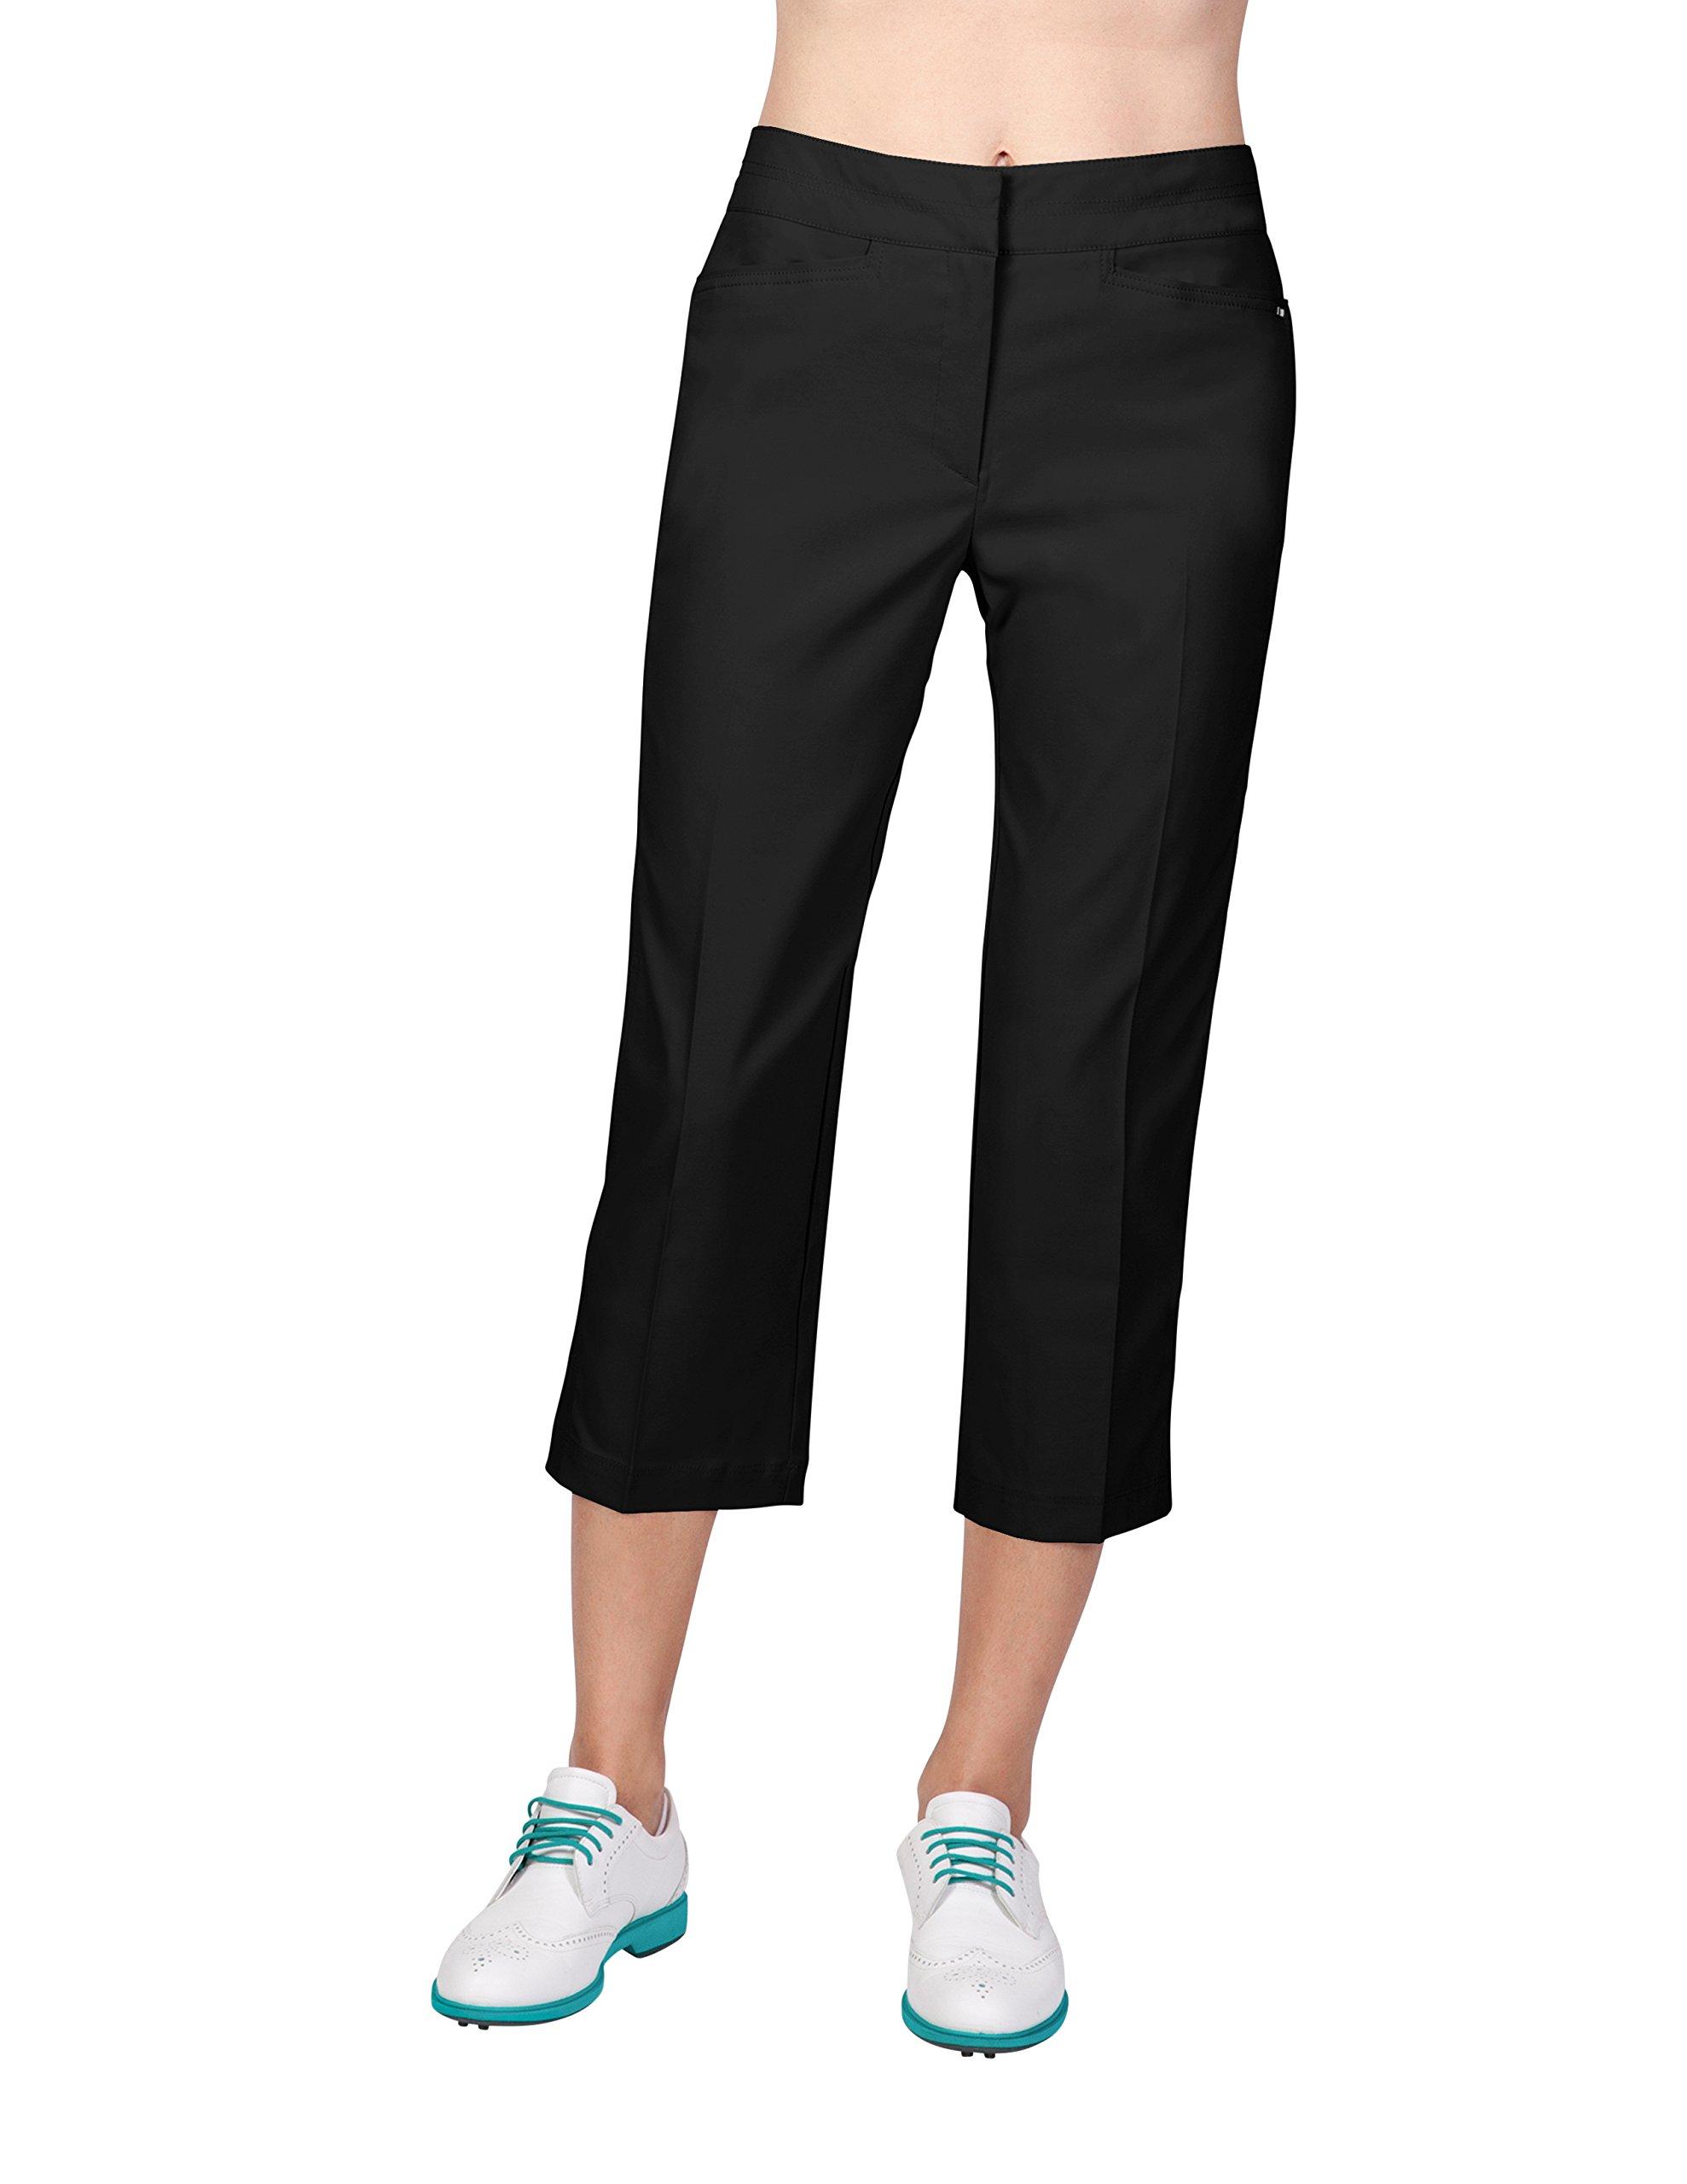 Tail Activewear Women's Classic Capri 10 Black